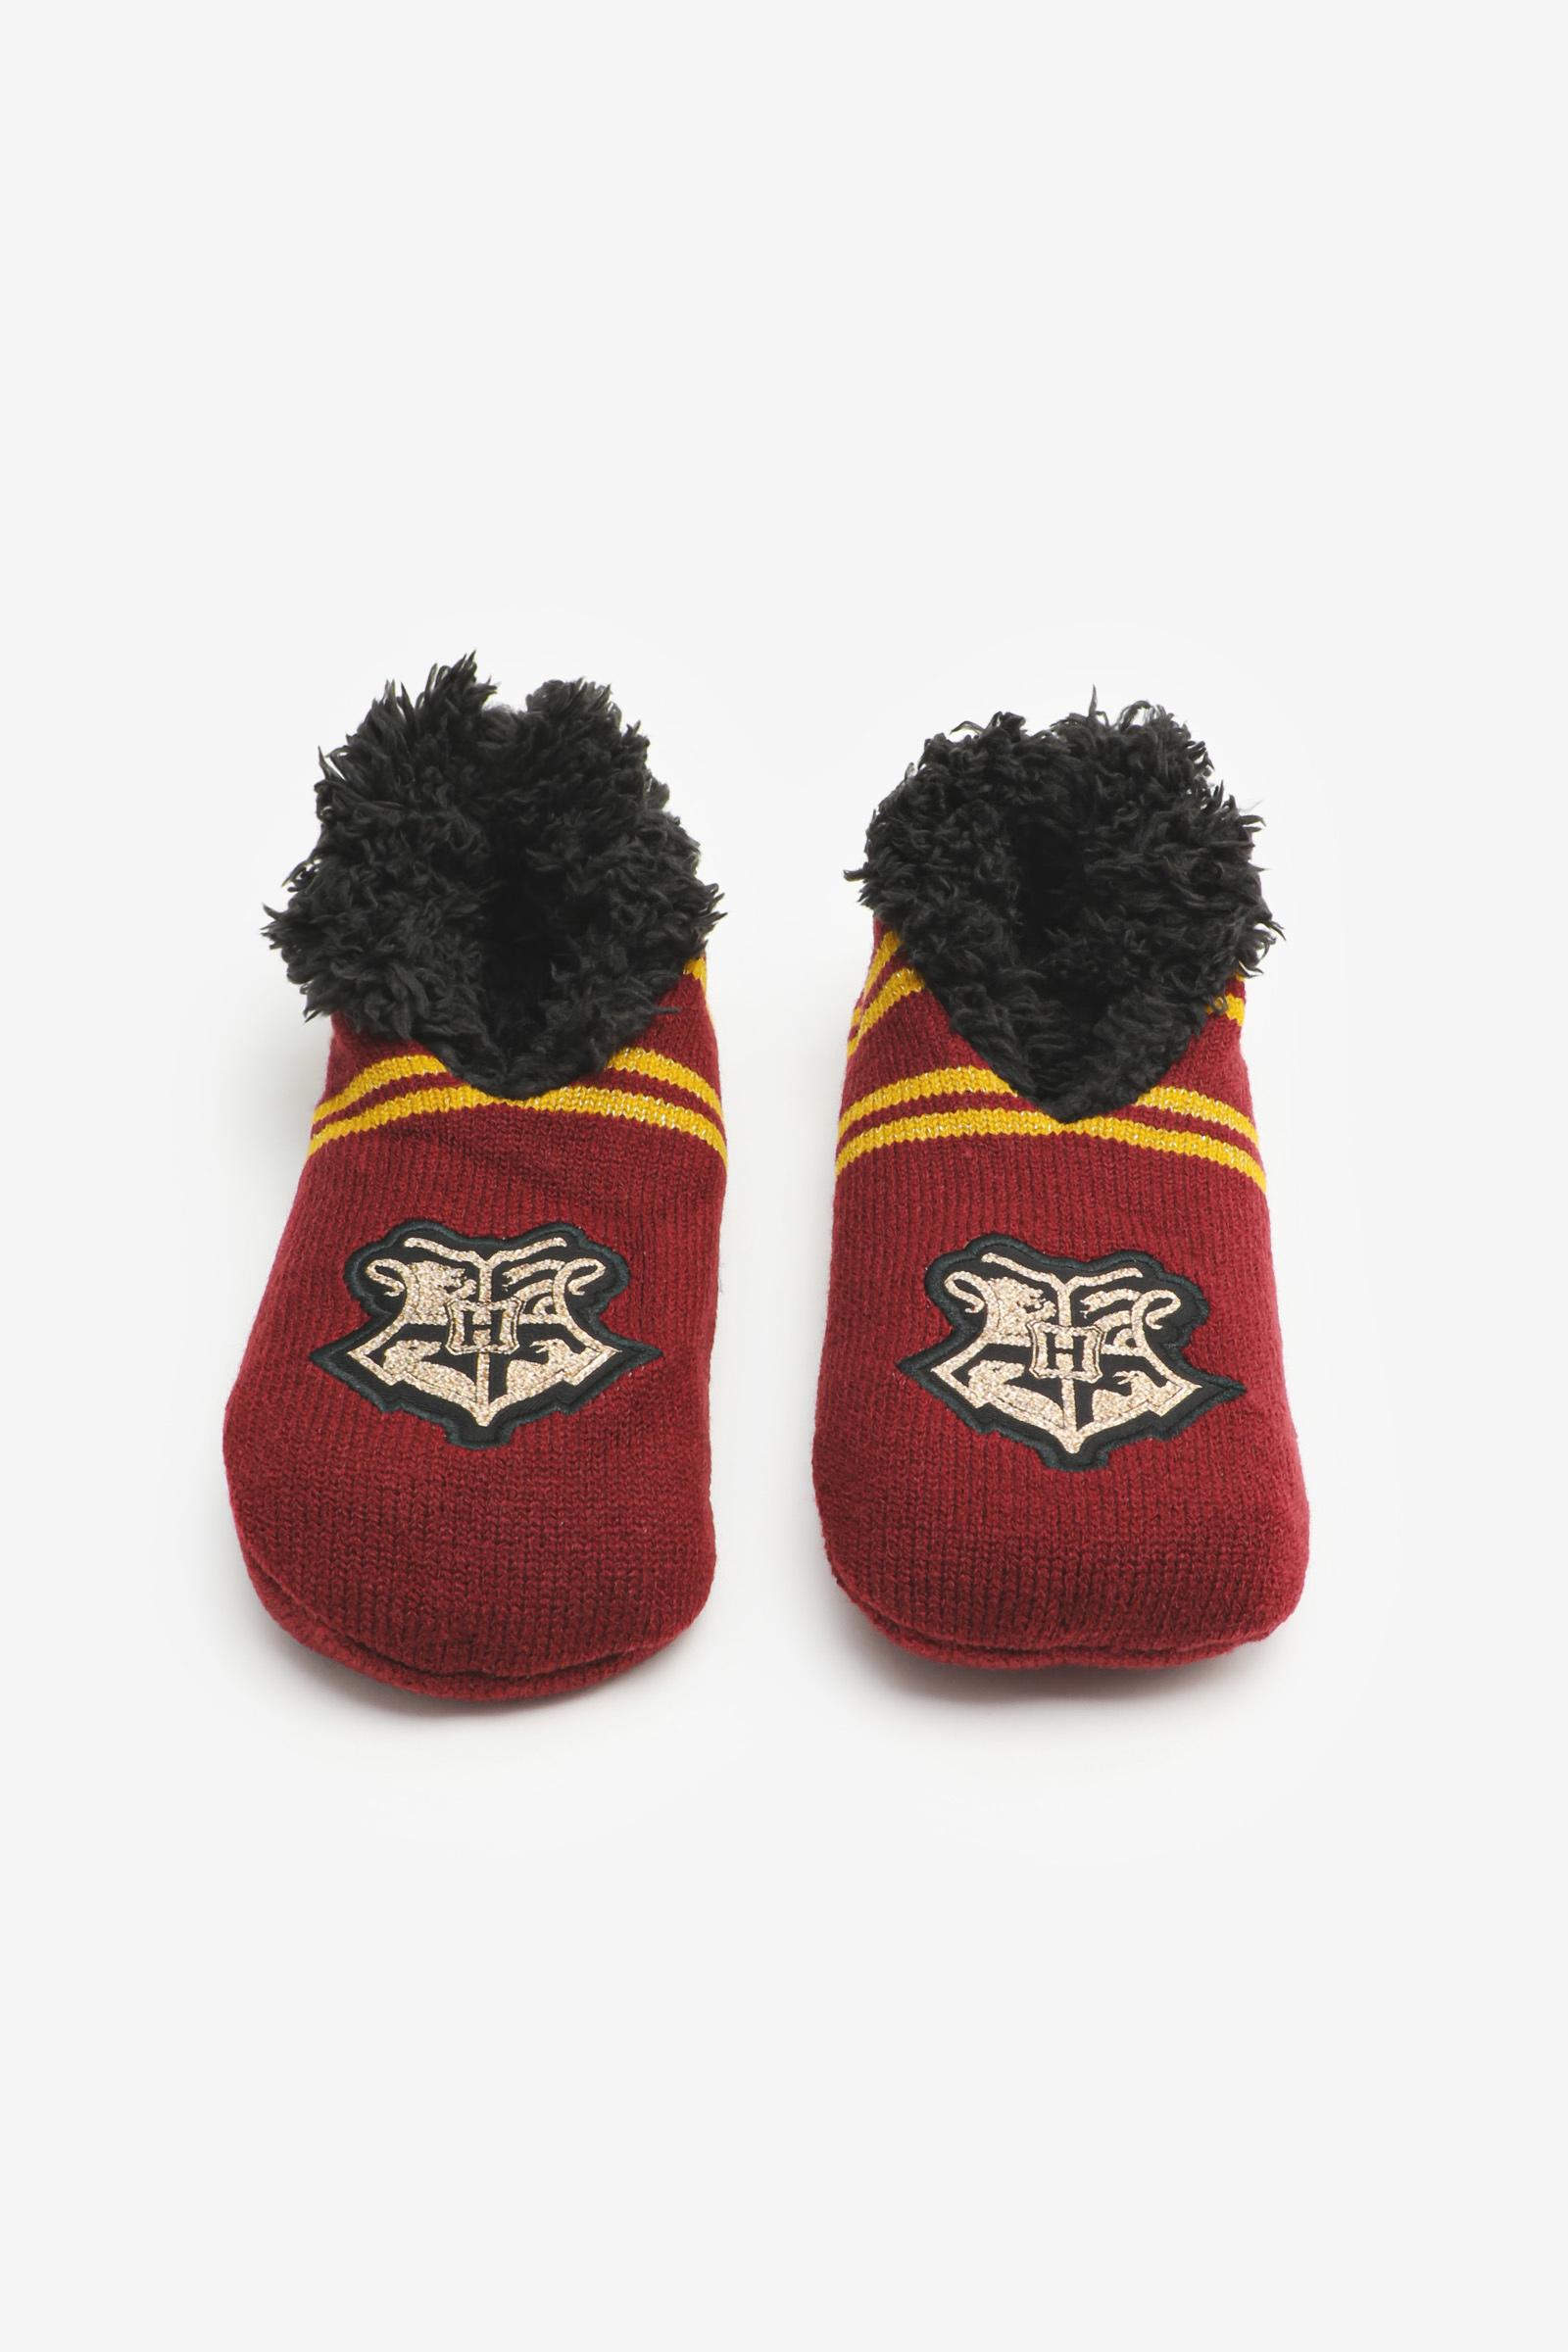 Gryffindor Slip-On Slippers